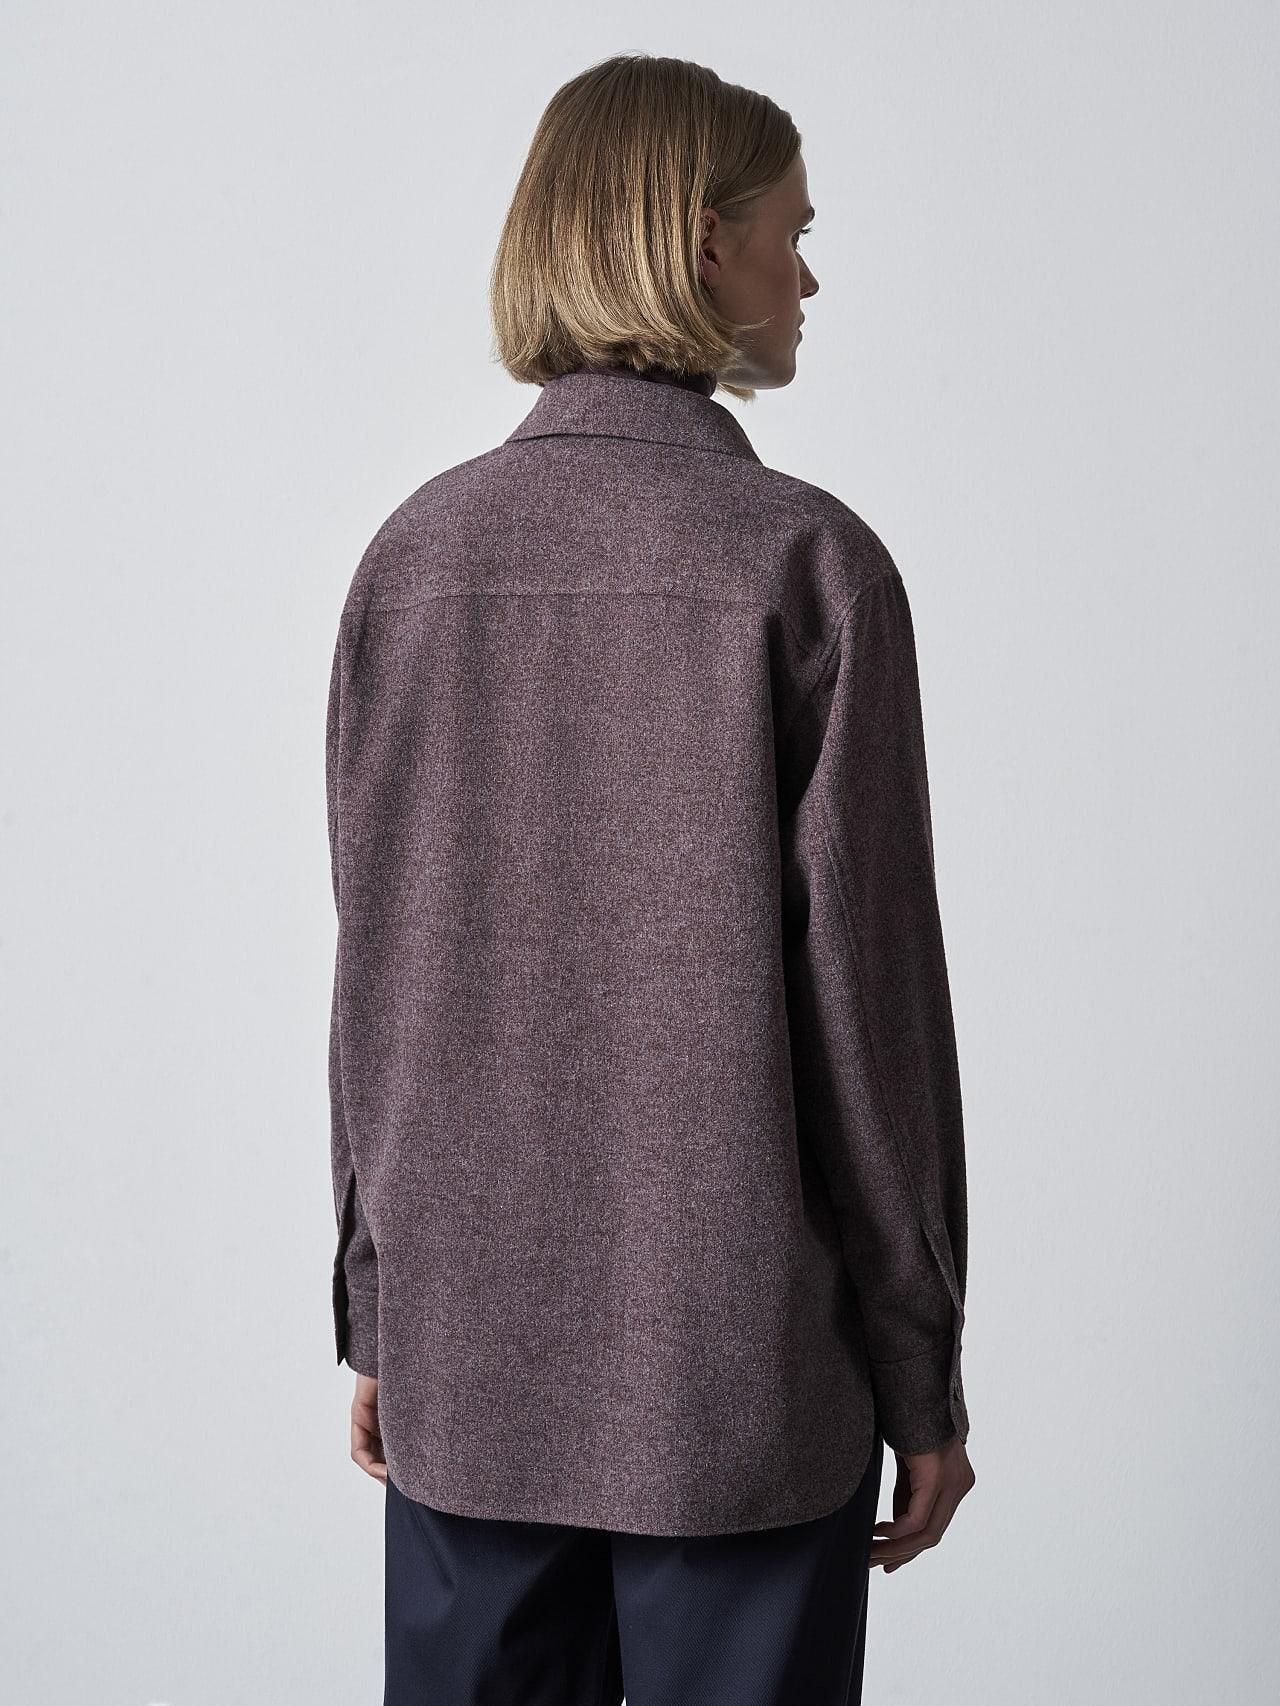 WOVIE V1.Y5.02 Wool Over-Shirt Burgundy Front Main Alpha Tauri